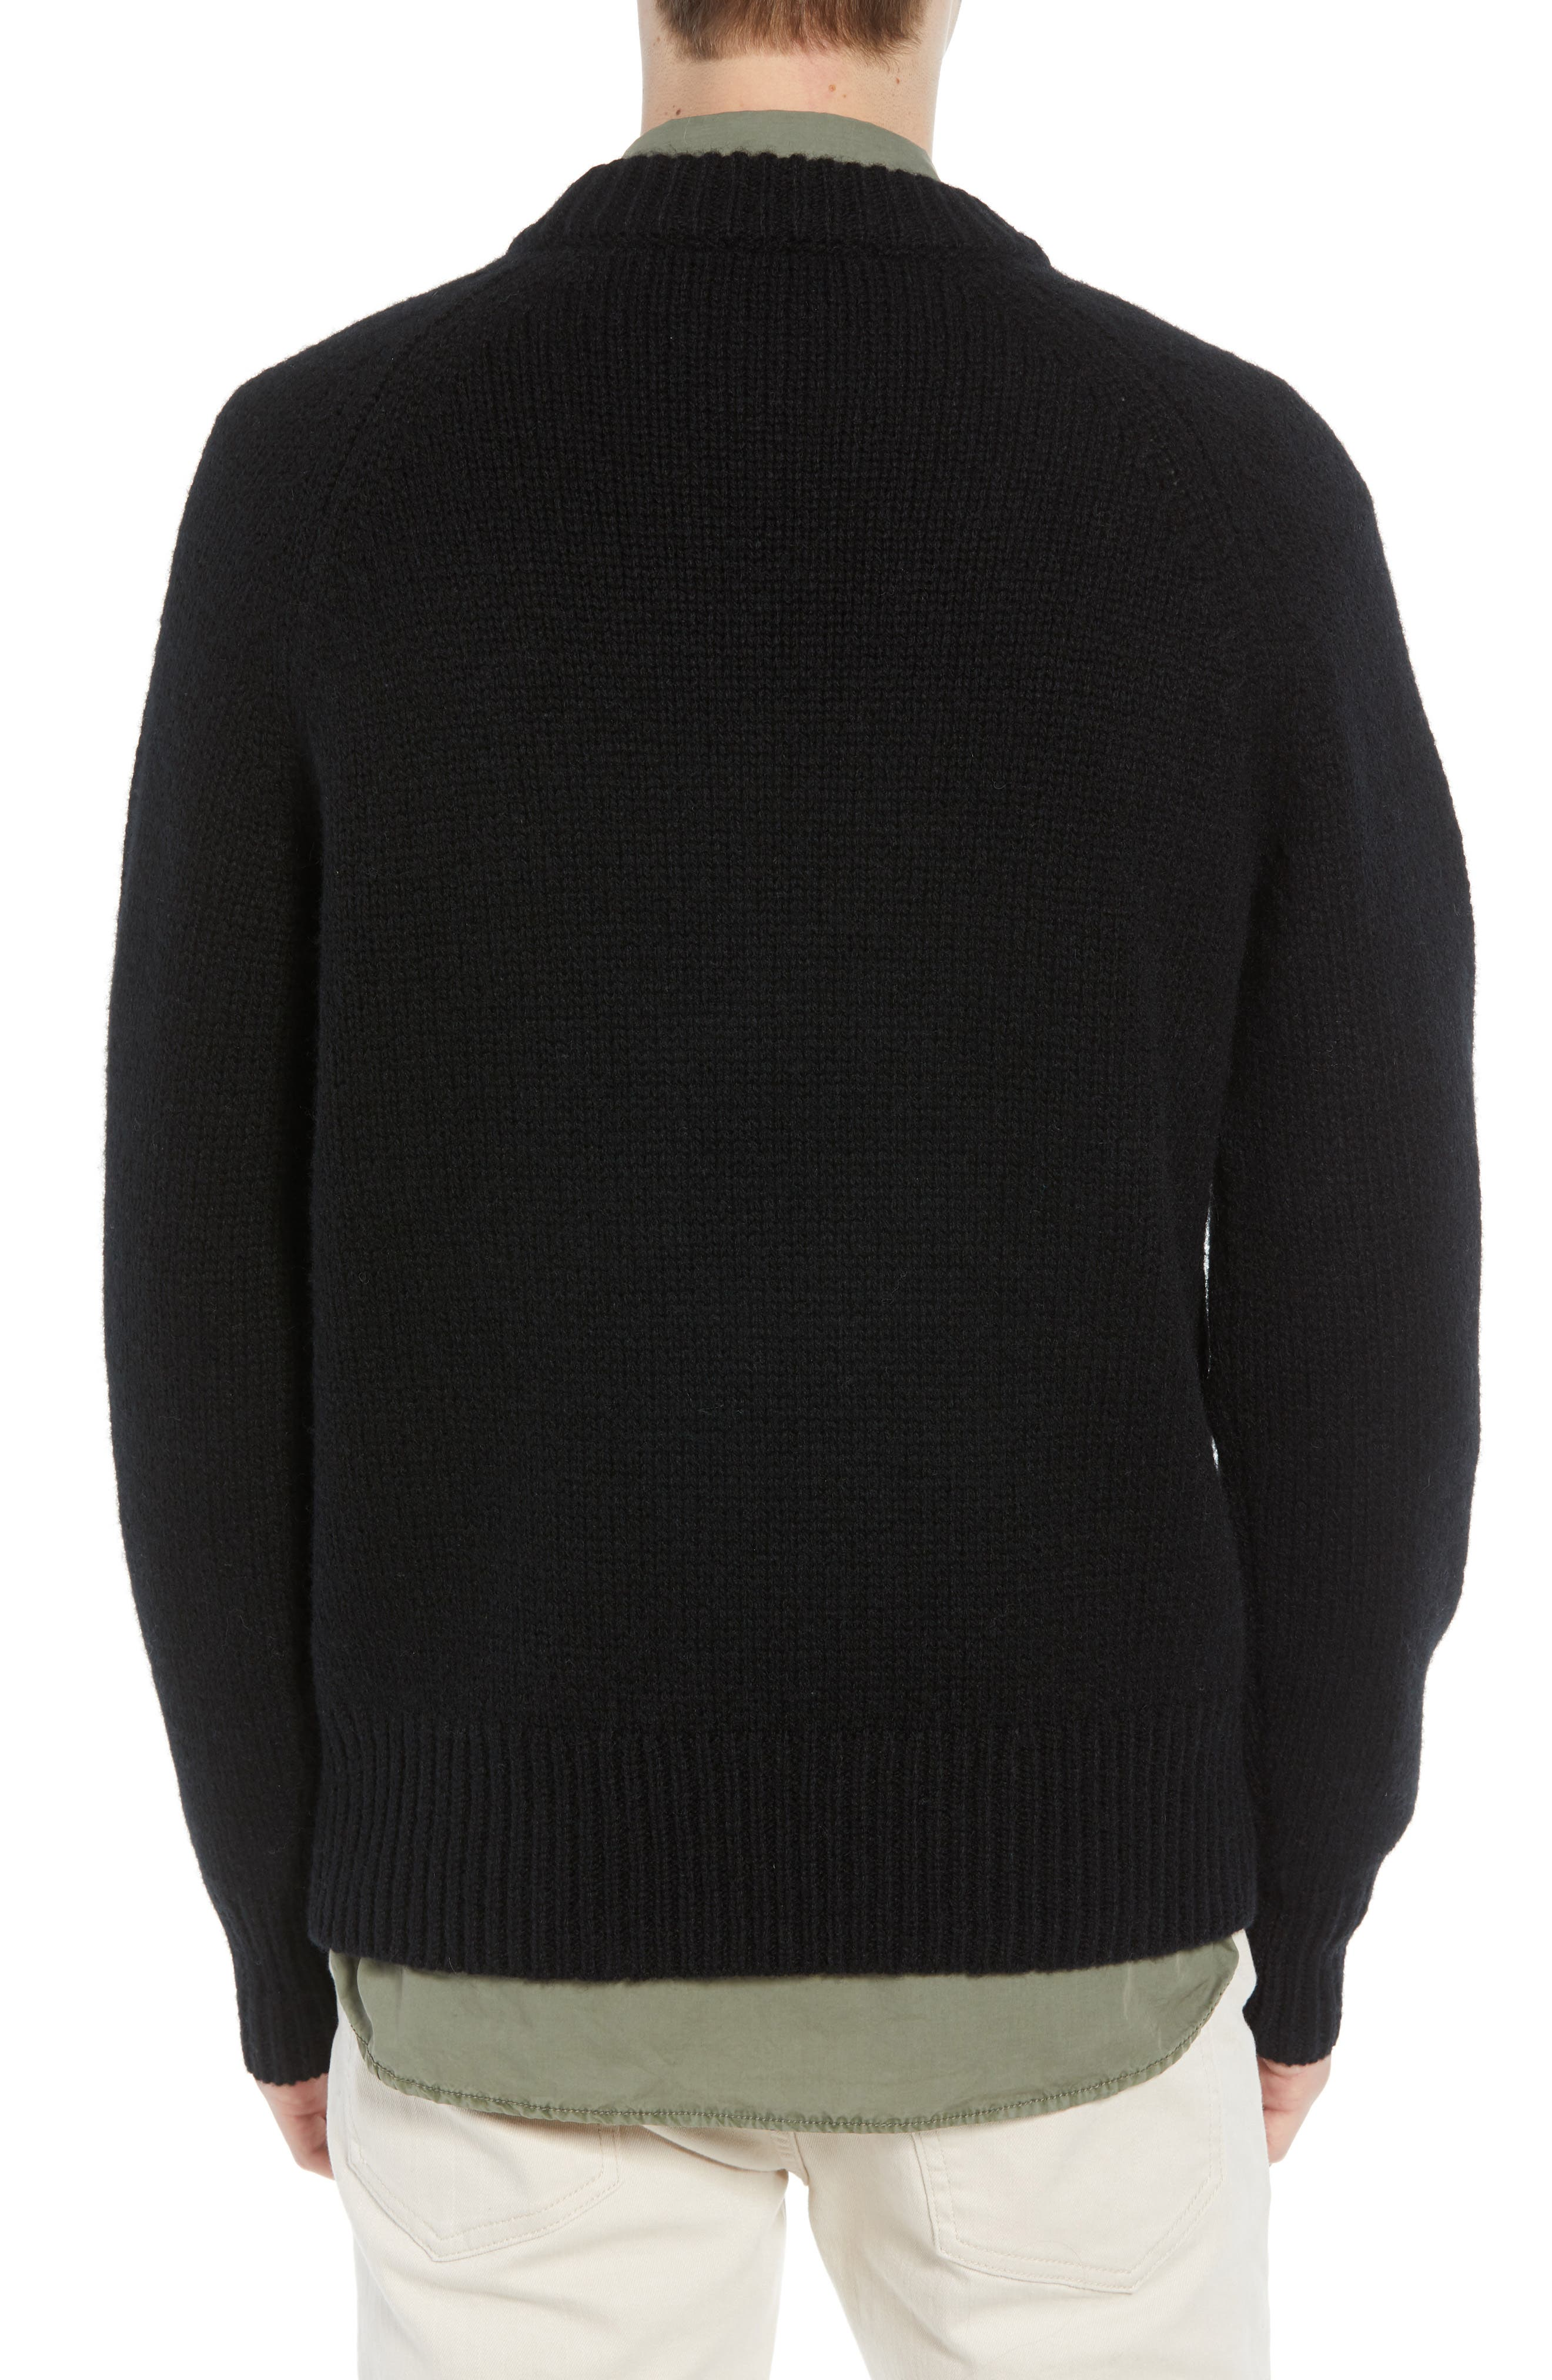 Star Wool Sweater,                             Alternate thumbnail 2, color,                             BLACK WHITECAP GREY